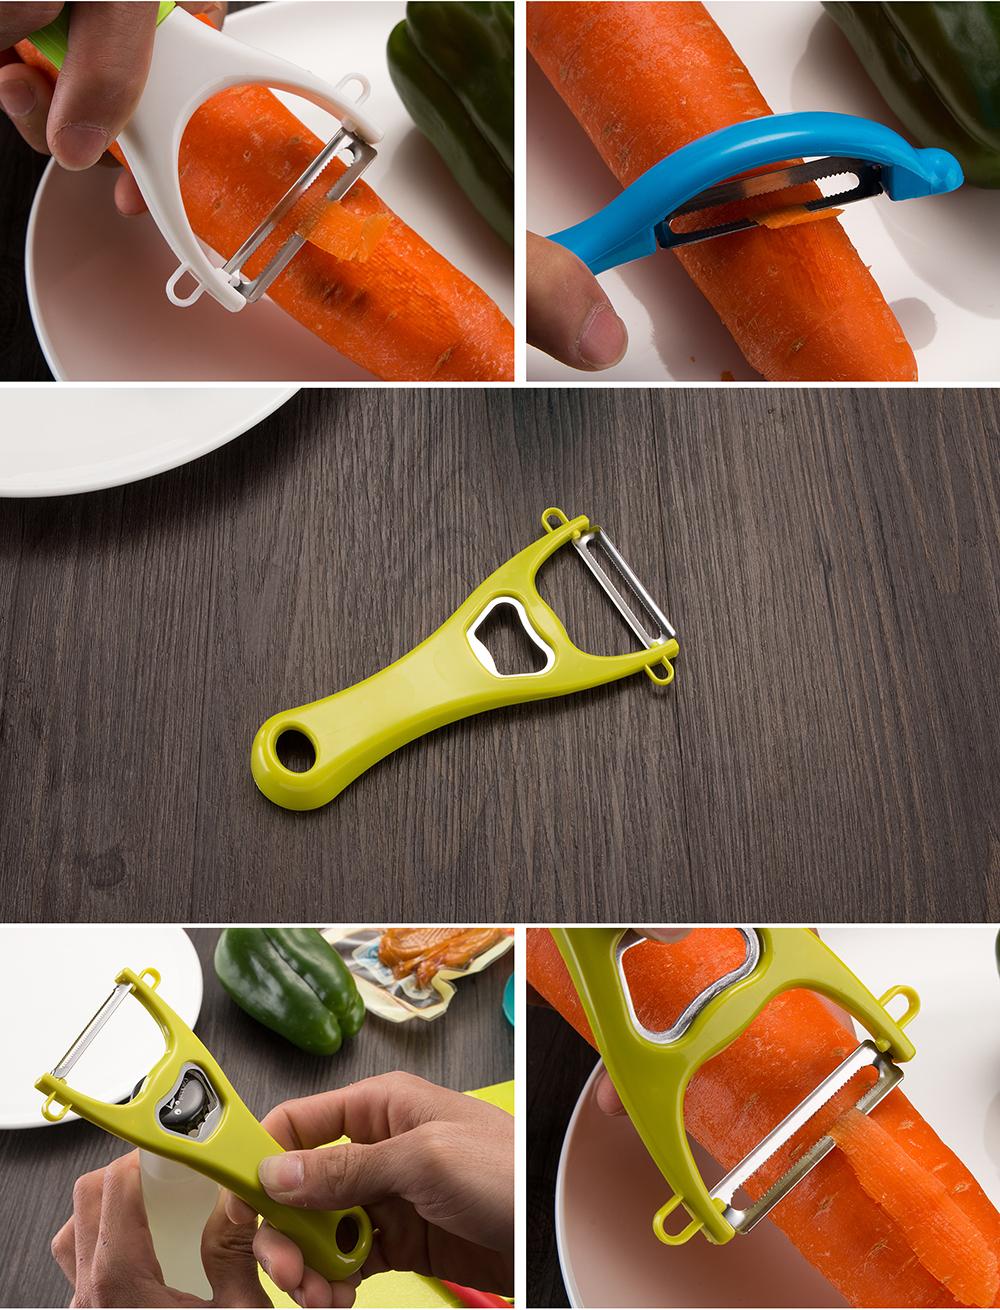 5PCS Vegetable Fruit Peeler Bottle Opener Fruit knife Set Carrot Potato Peeler Melon turnip Slicer Cutter Kitchen Cooking Tools 7